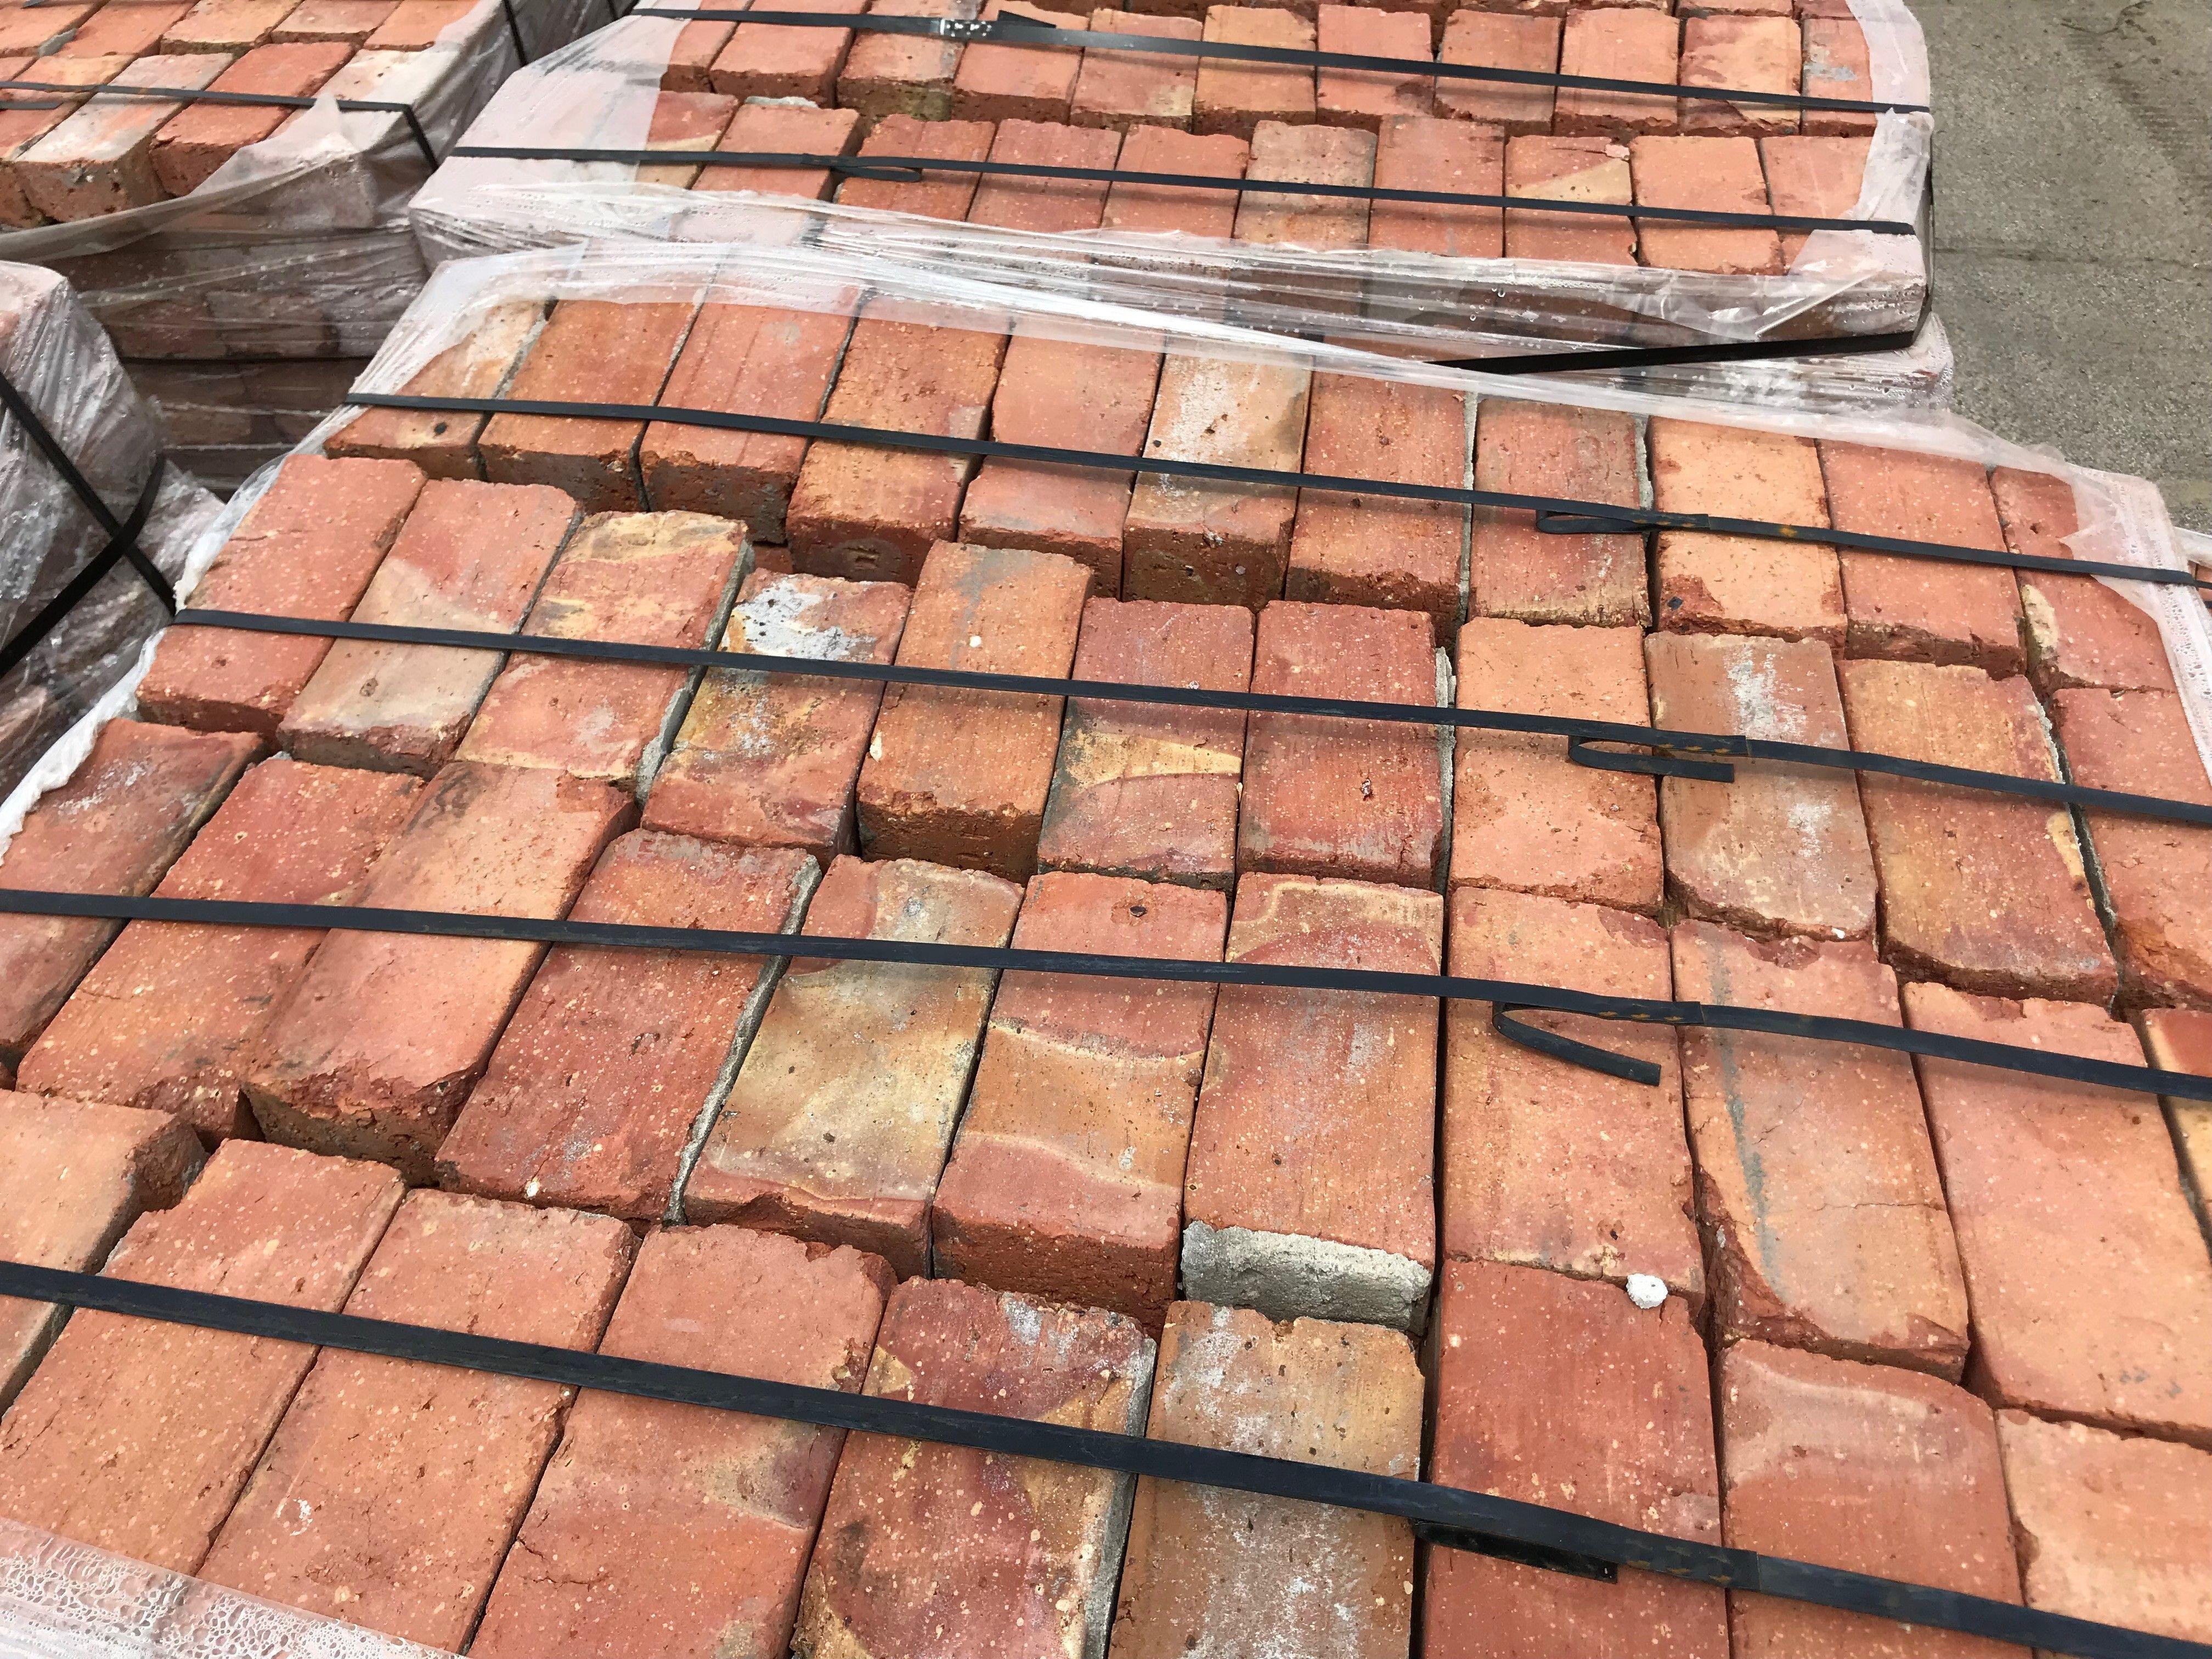 Reclaimed Chicago Common Brick Paving Grade Pallet F O B Miami Freight Terminal Brick Paving Reclaimed Brick Antique Brick